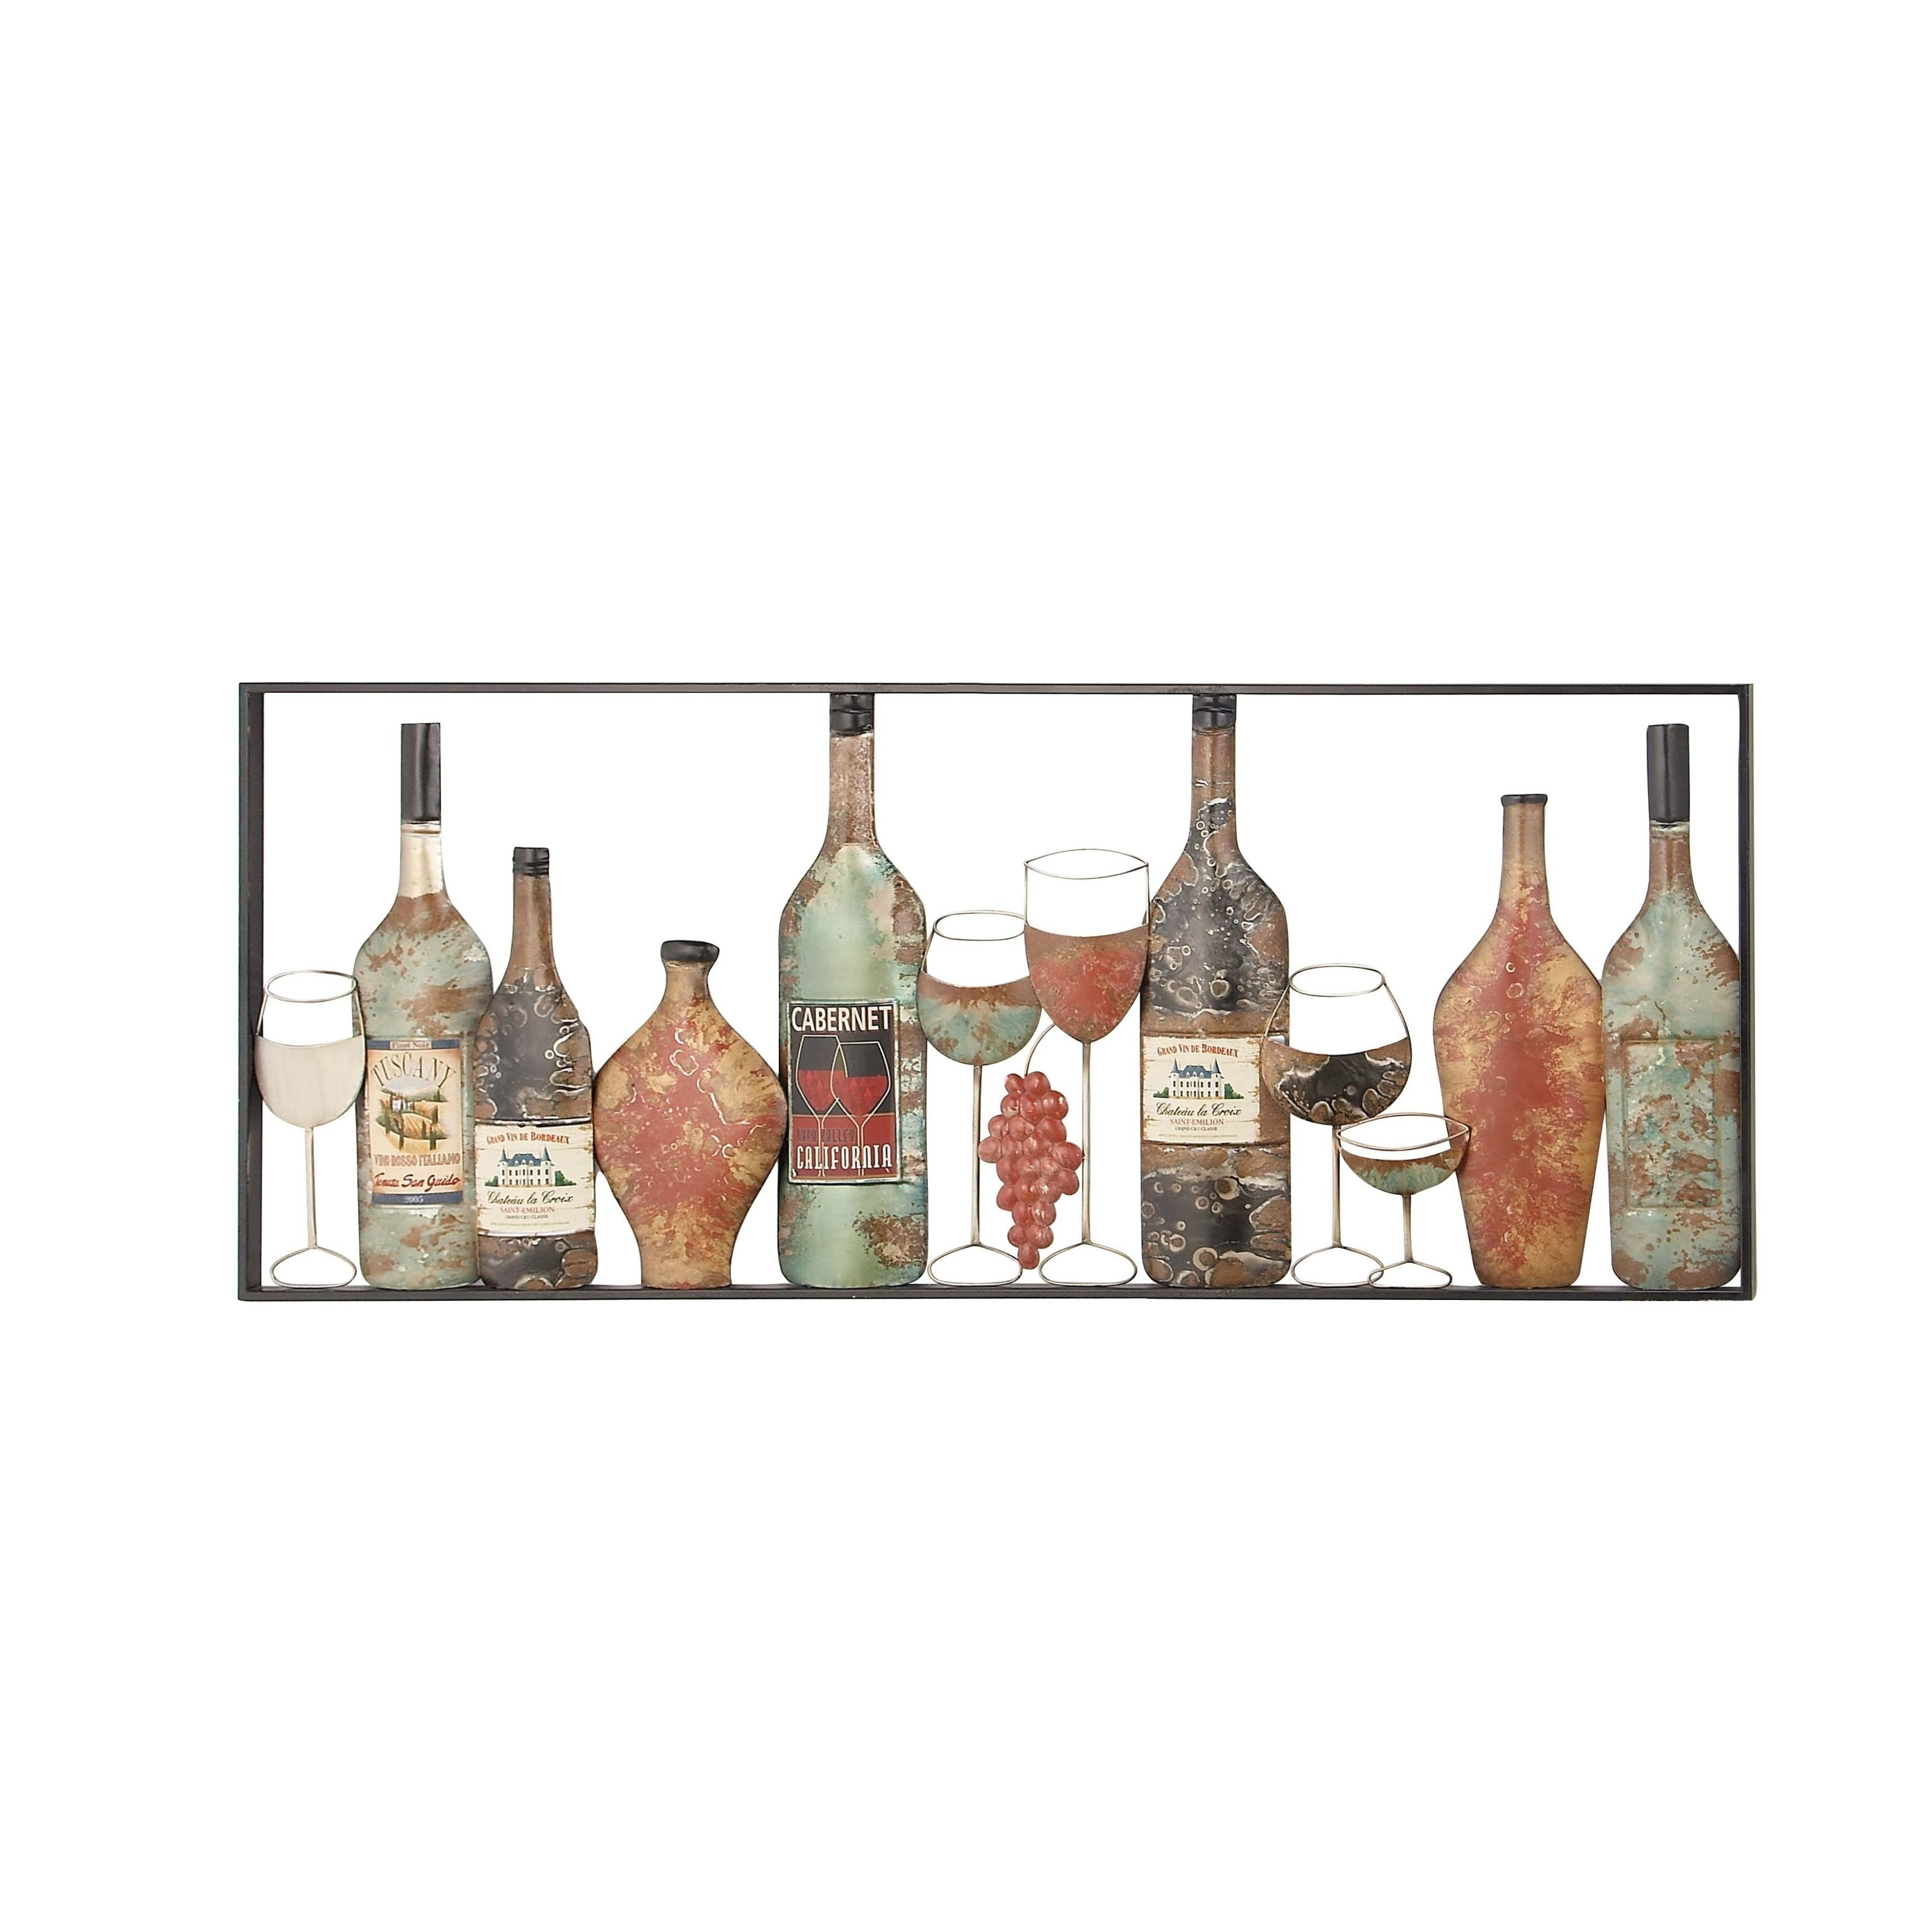 Rustic iron wine red bottles framed wall decor studio